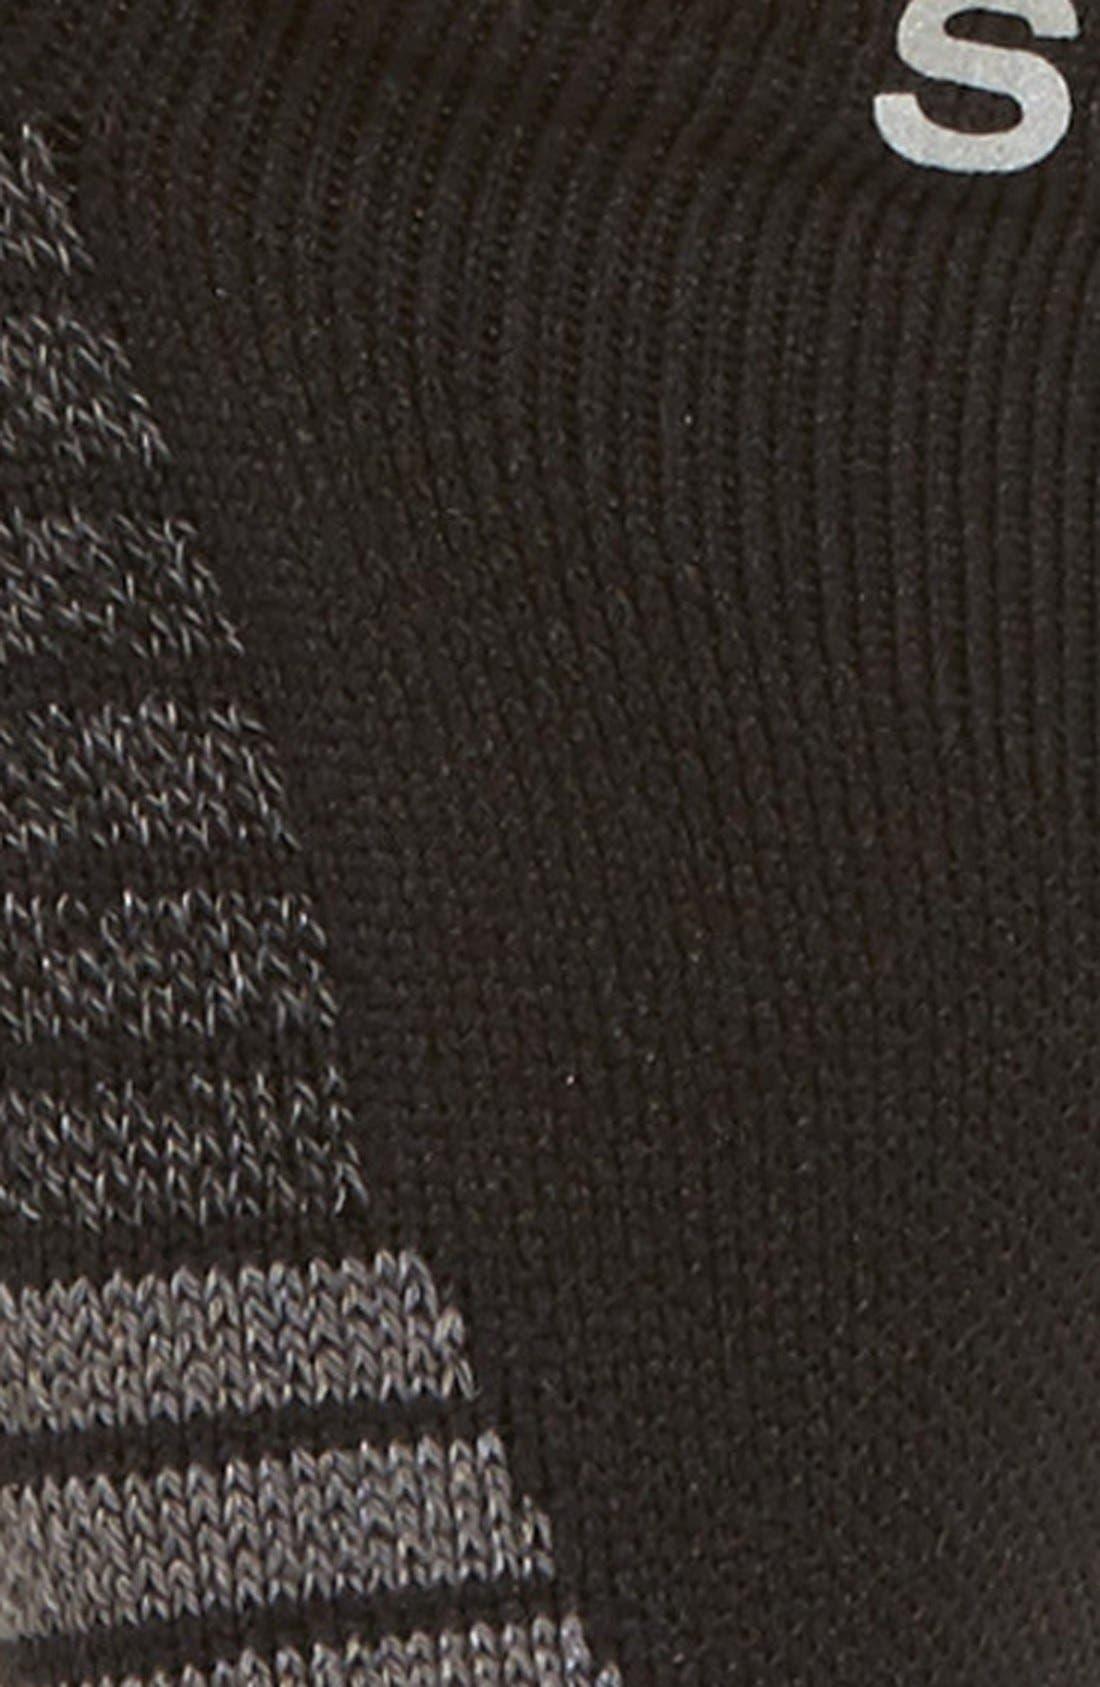 Reflective Sweat Socks,                             Alternate thumbnail 4, color,                             001